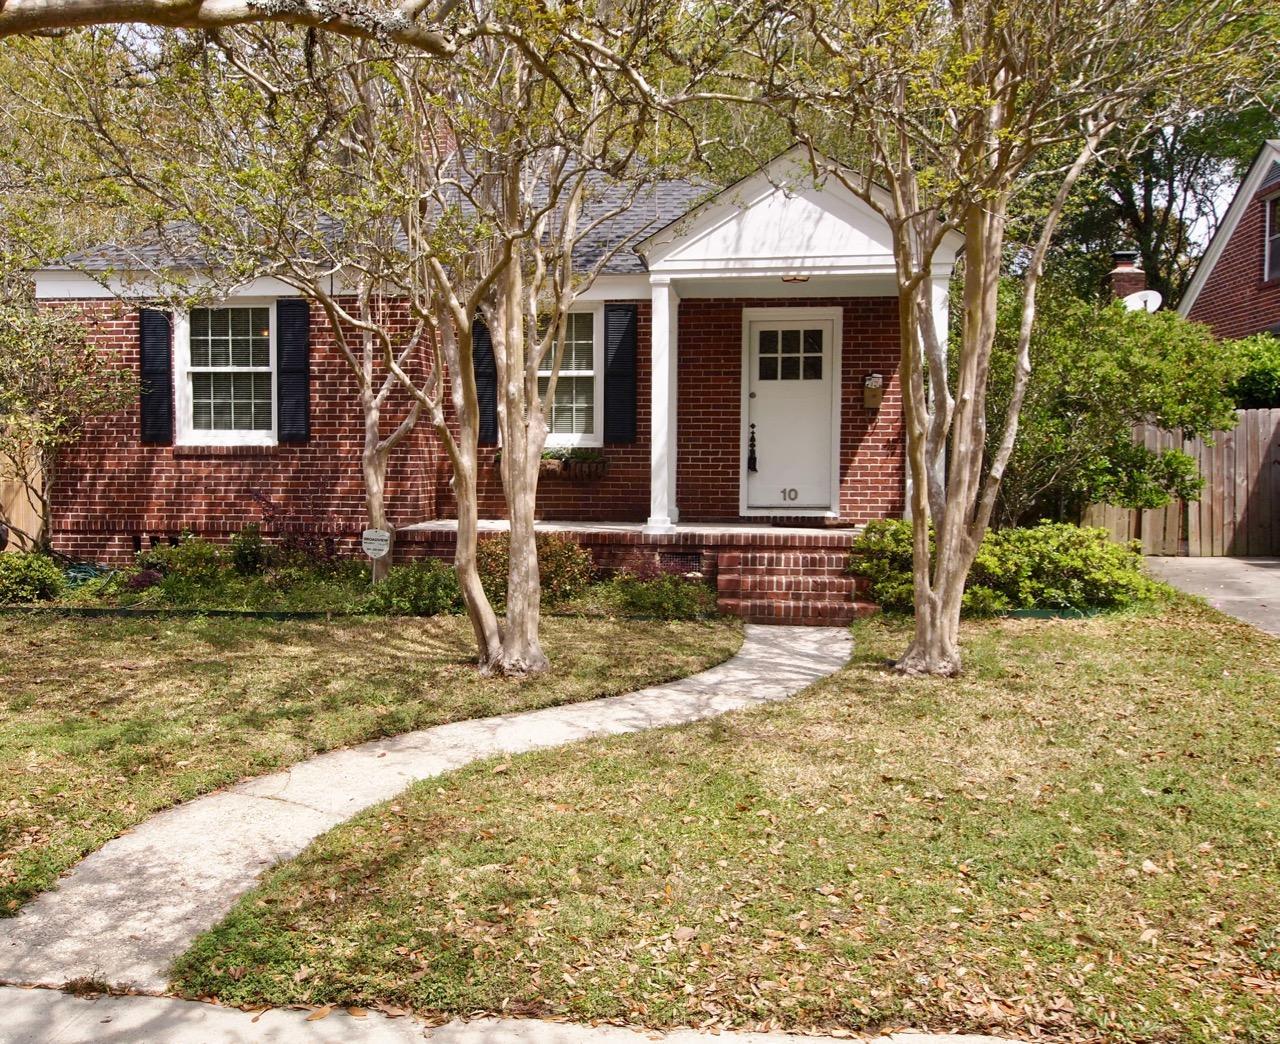 Byrnes Downs Homes For Sale - 10 Lyttleton, Charleston, SC - 4